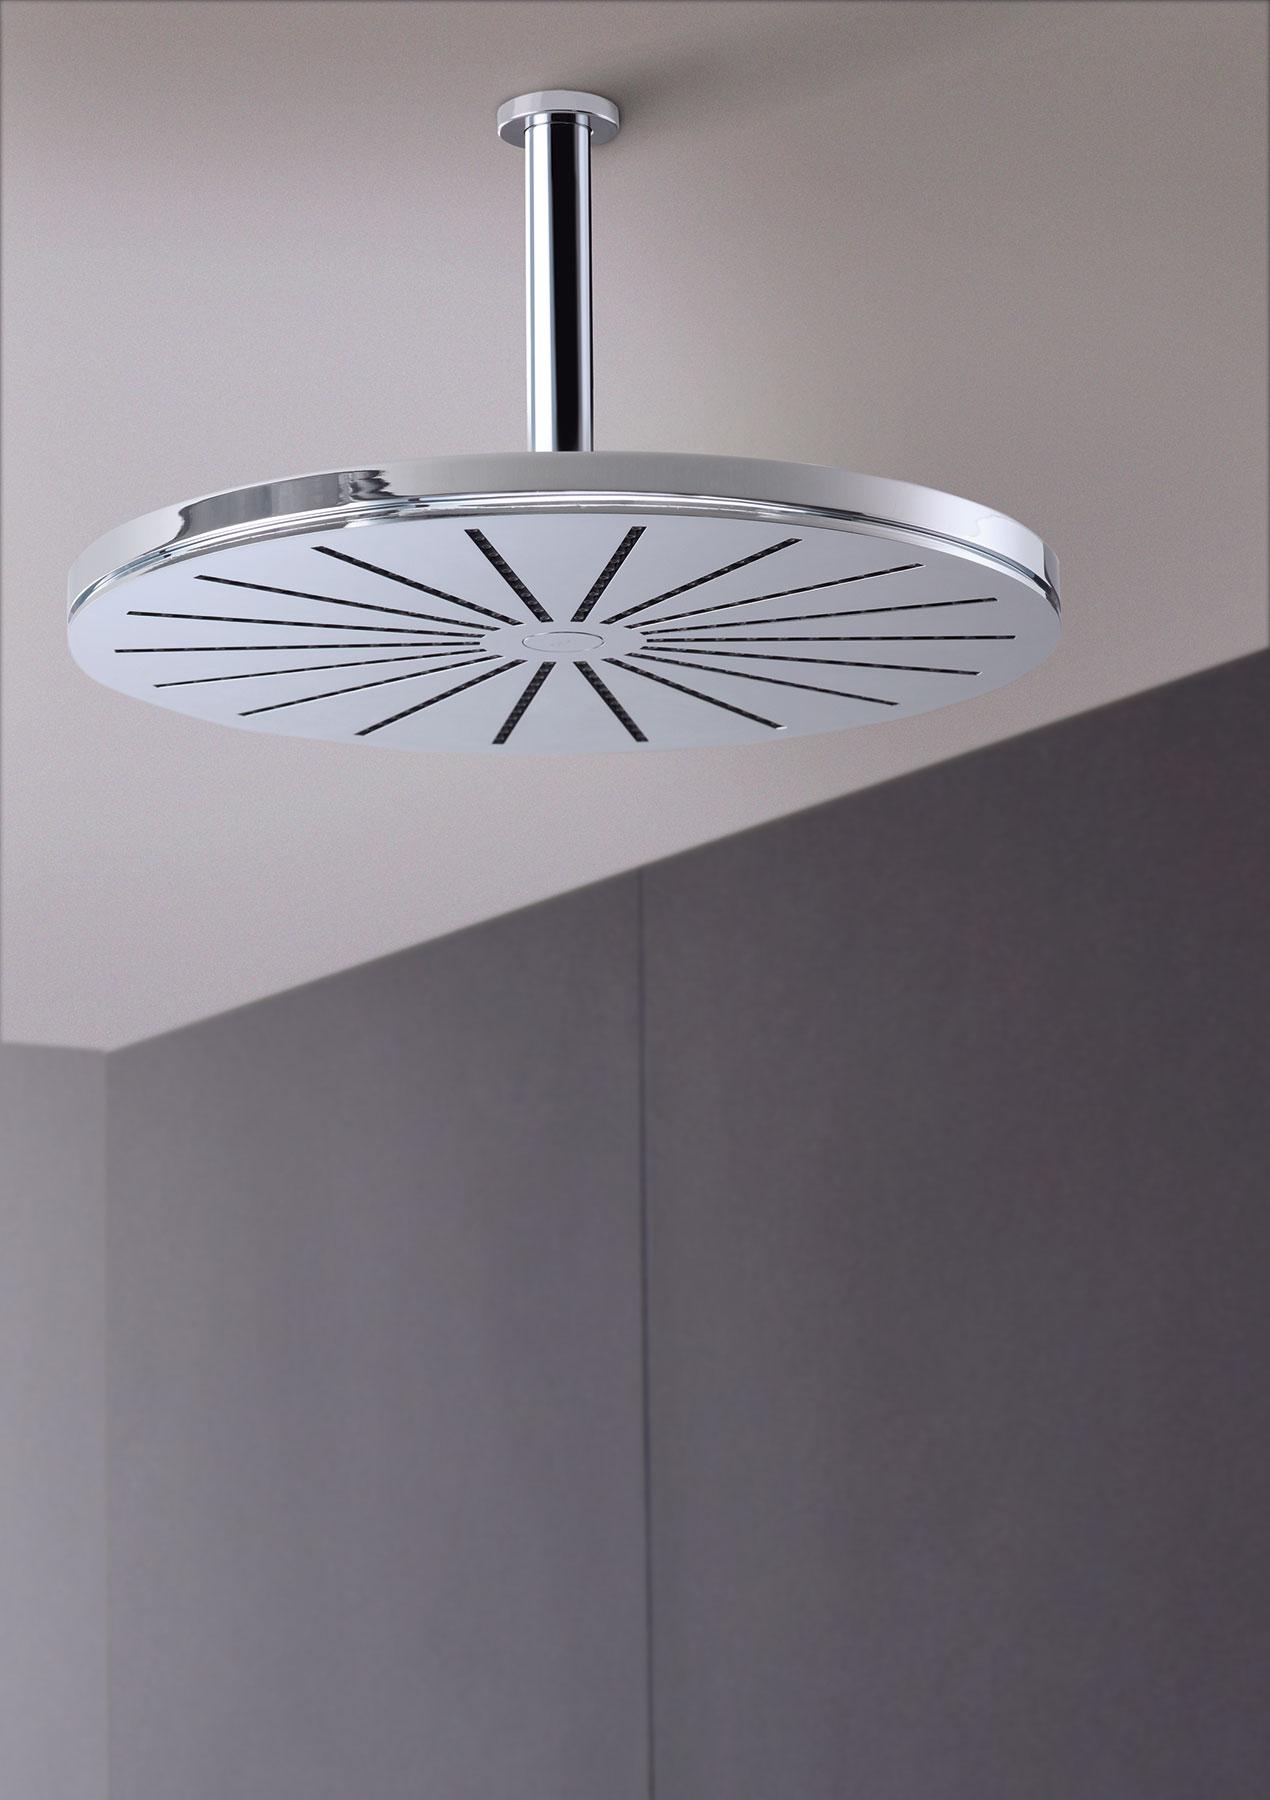 Modern Vola Ceiling Mount Shower Head Set